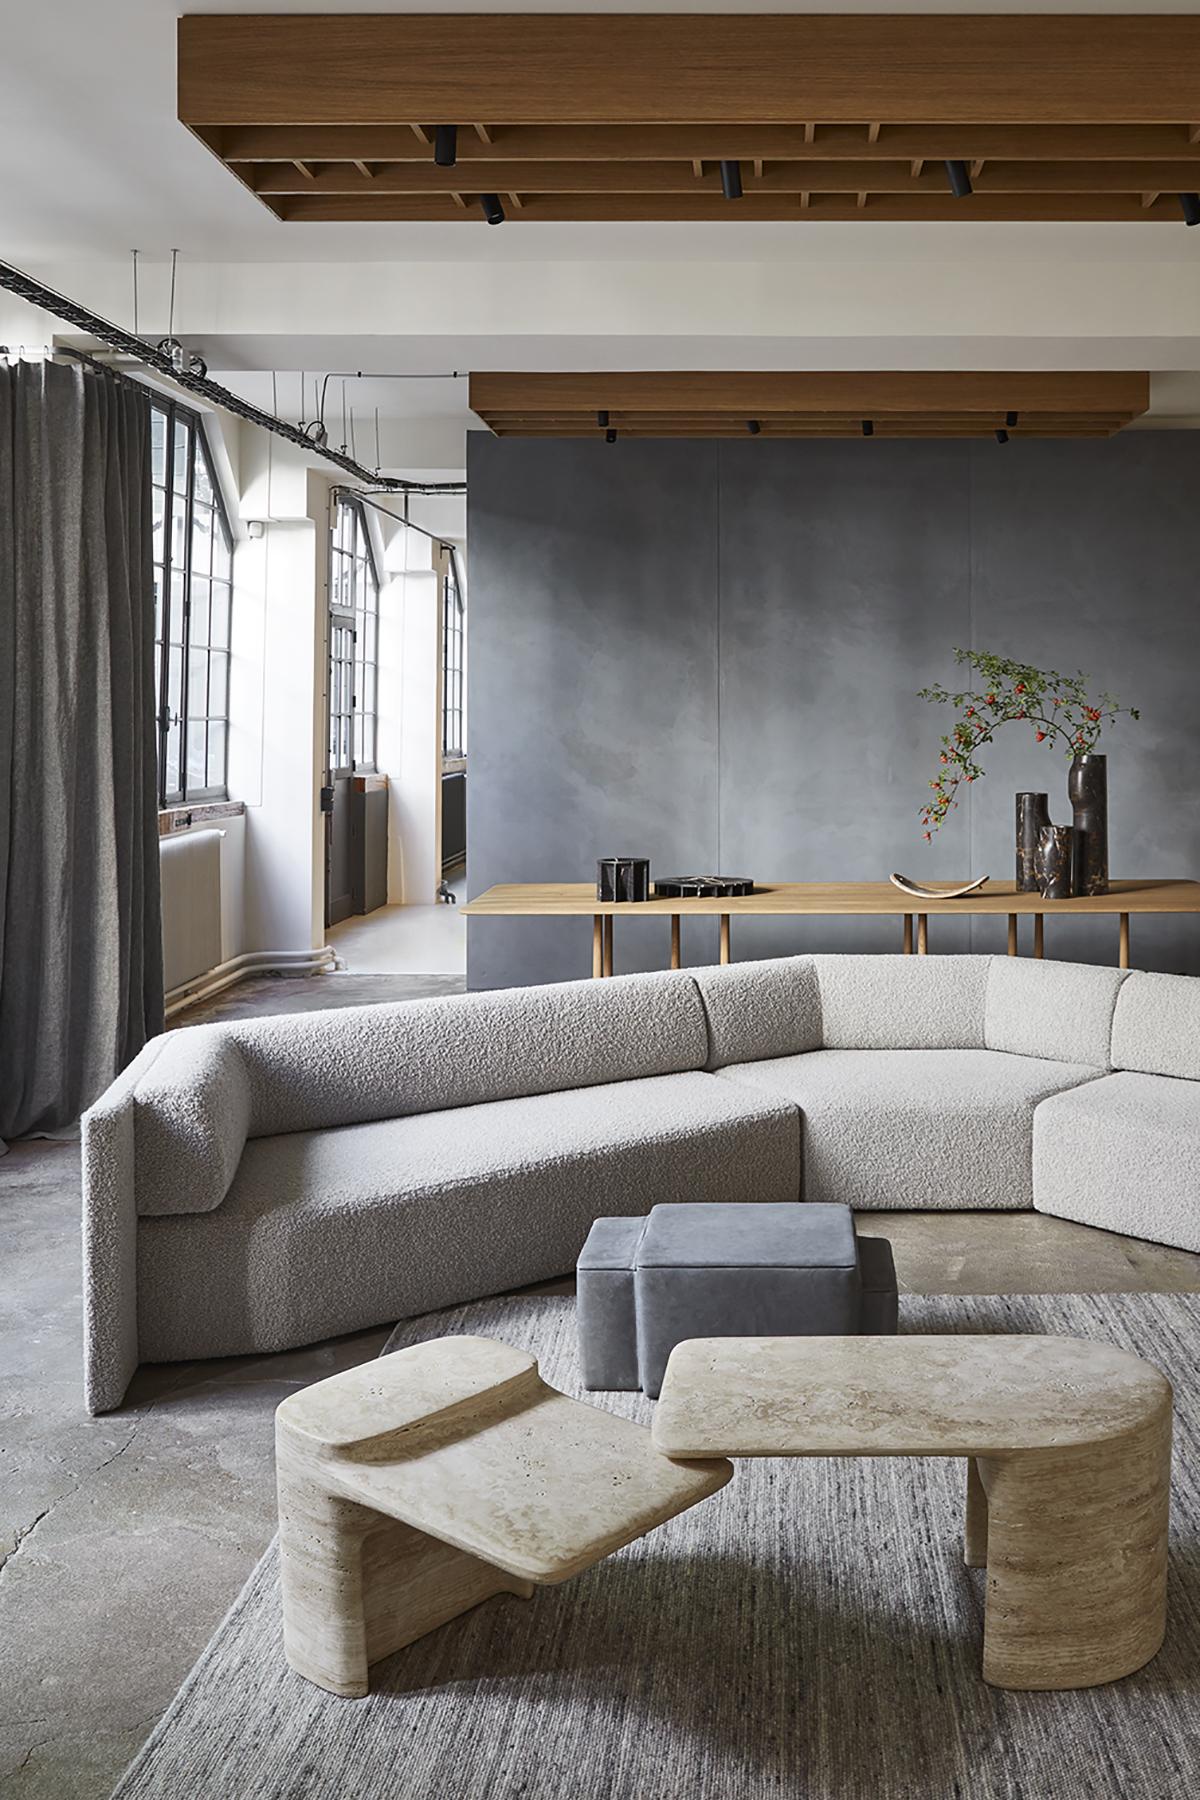 Declourt Collection - EKO sofa - TYE table